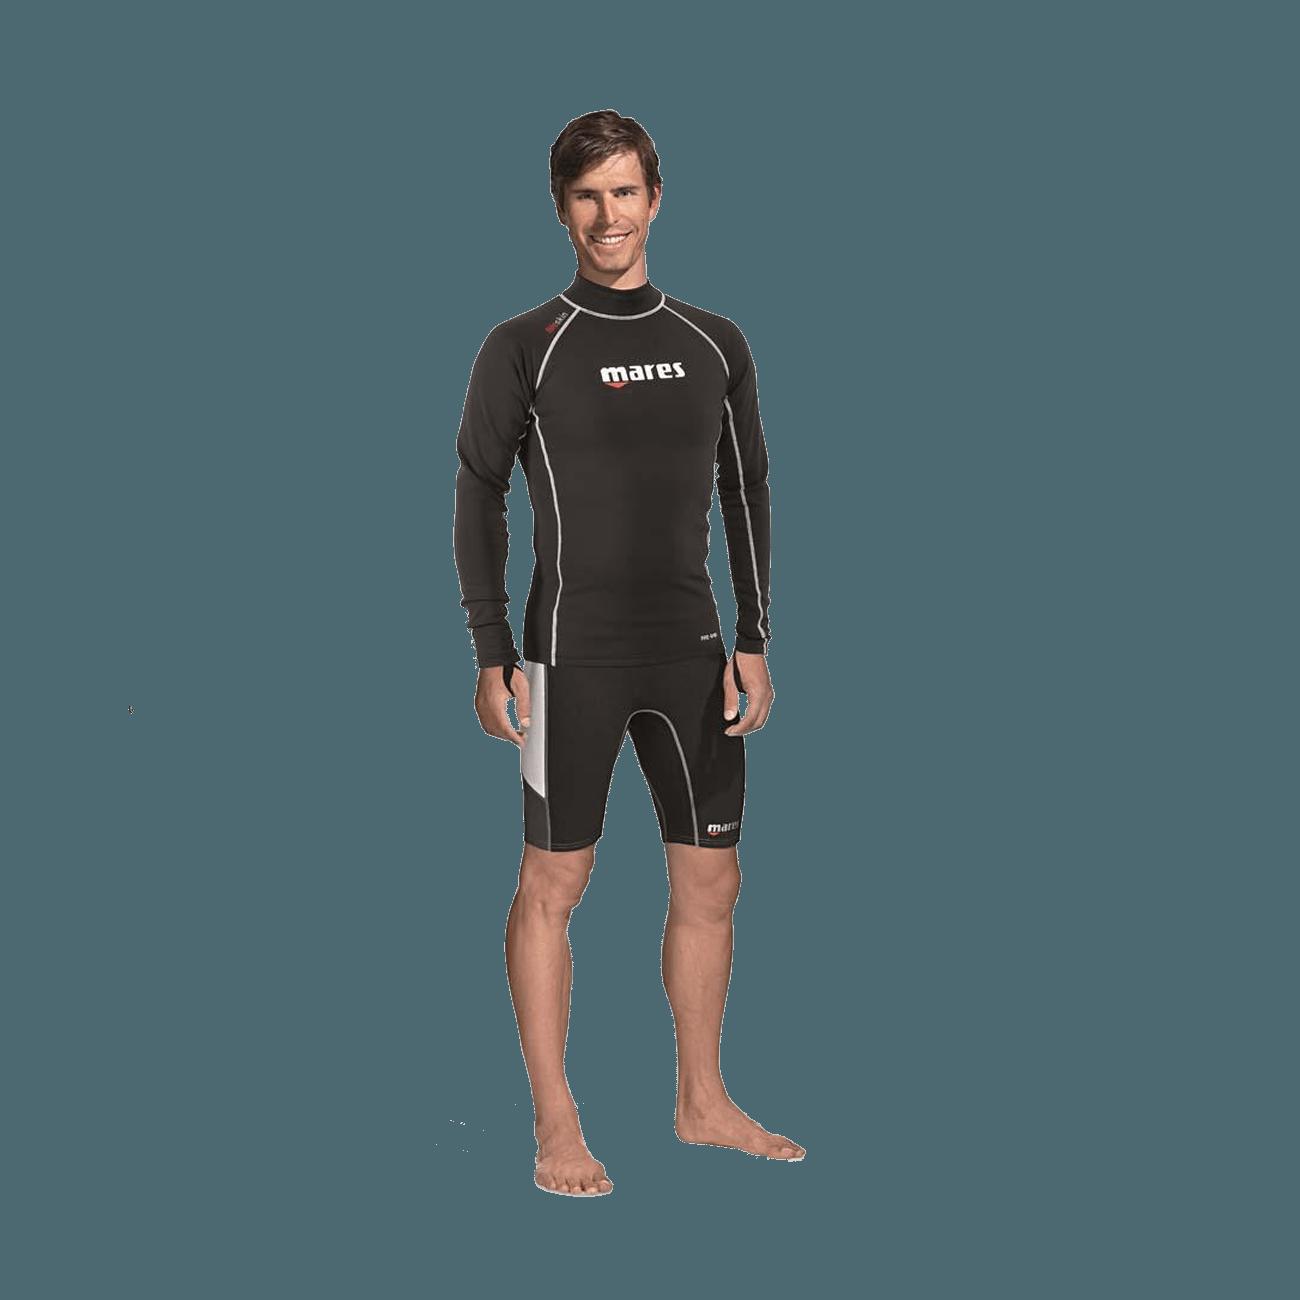 Mares Fire Skin Long sleeve Rashguard | Mares Rashguards | Gill Divers